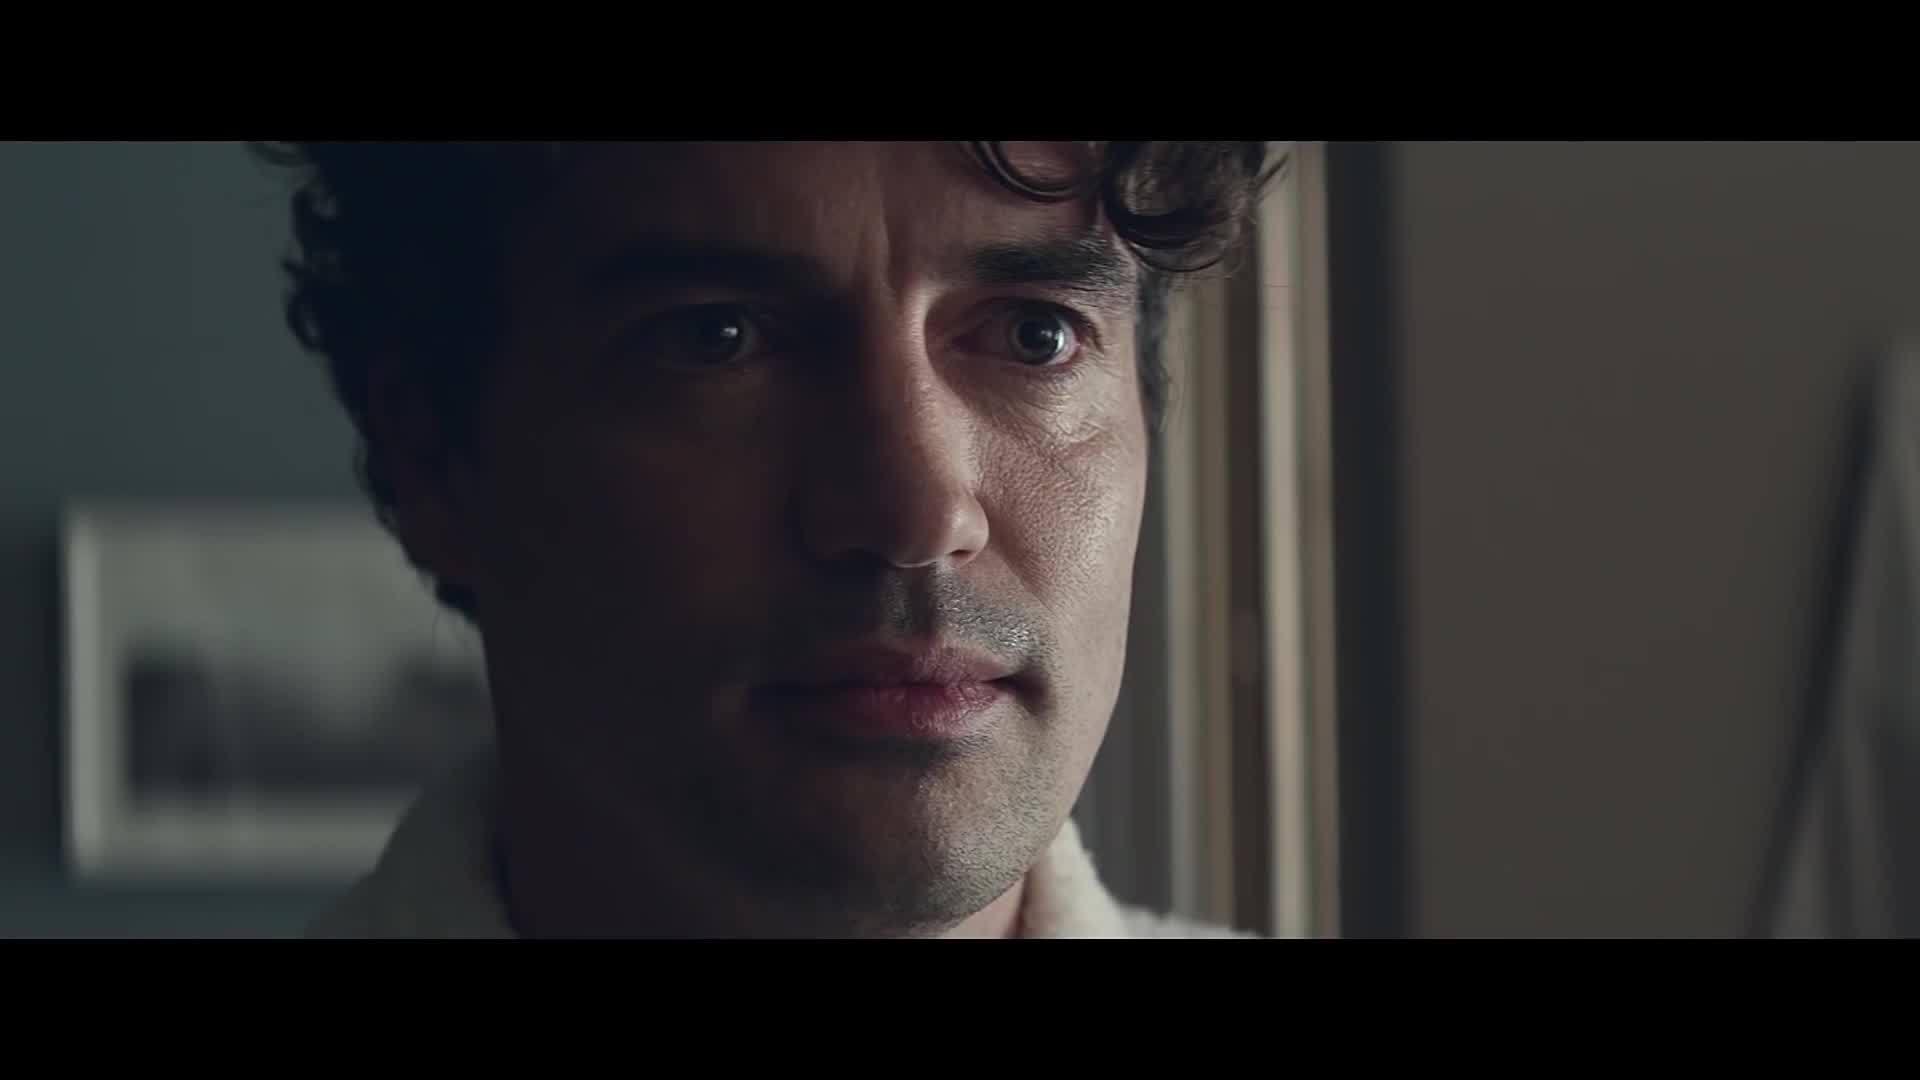 WATCH: Gillette's new ad stirs online uproar